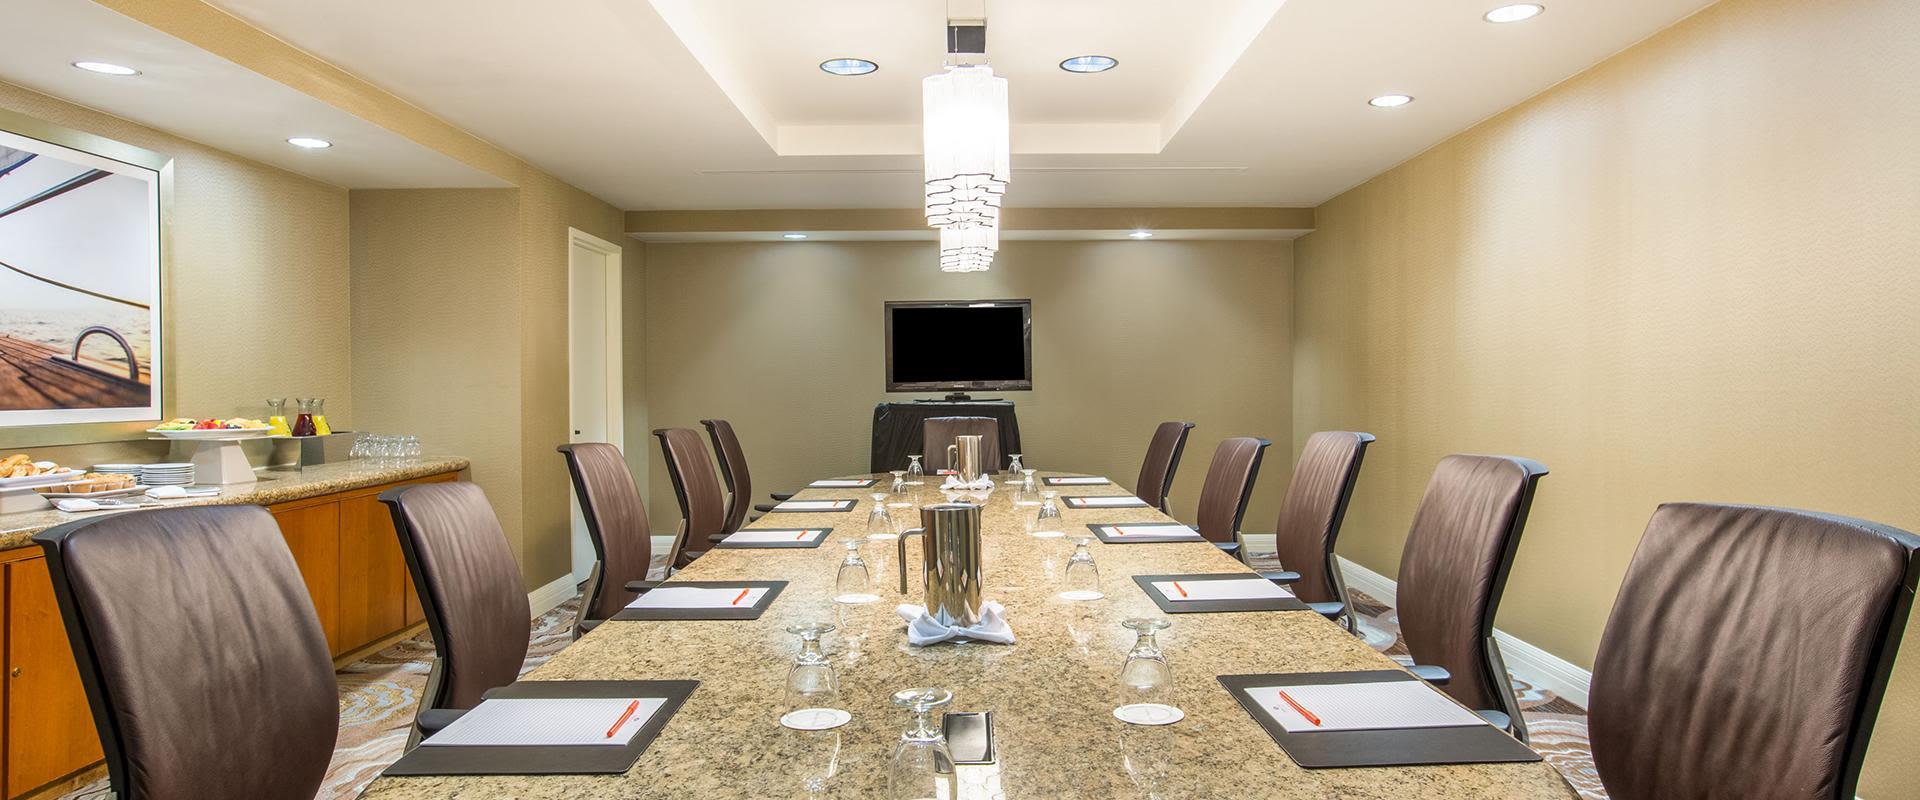 Redondo Beach Boardroom Interior